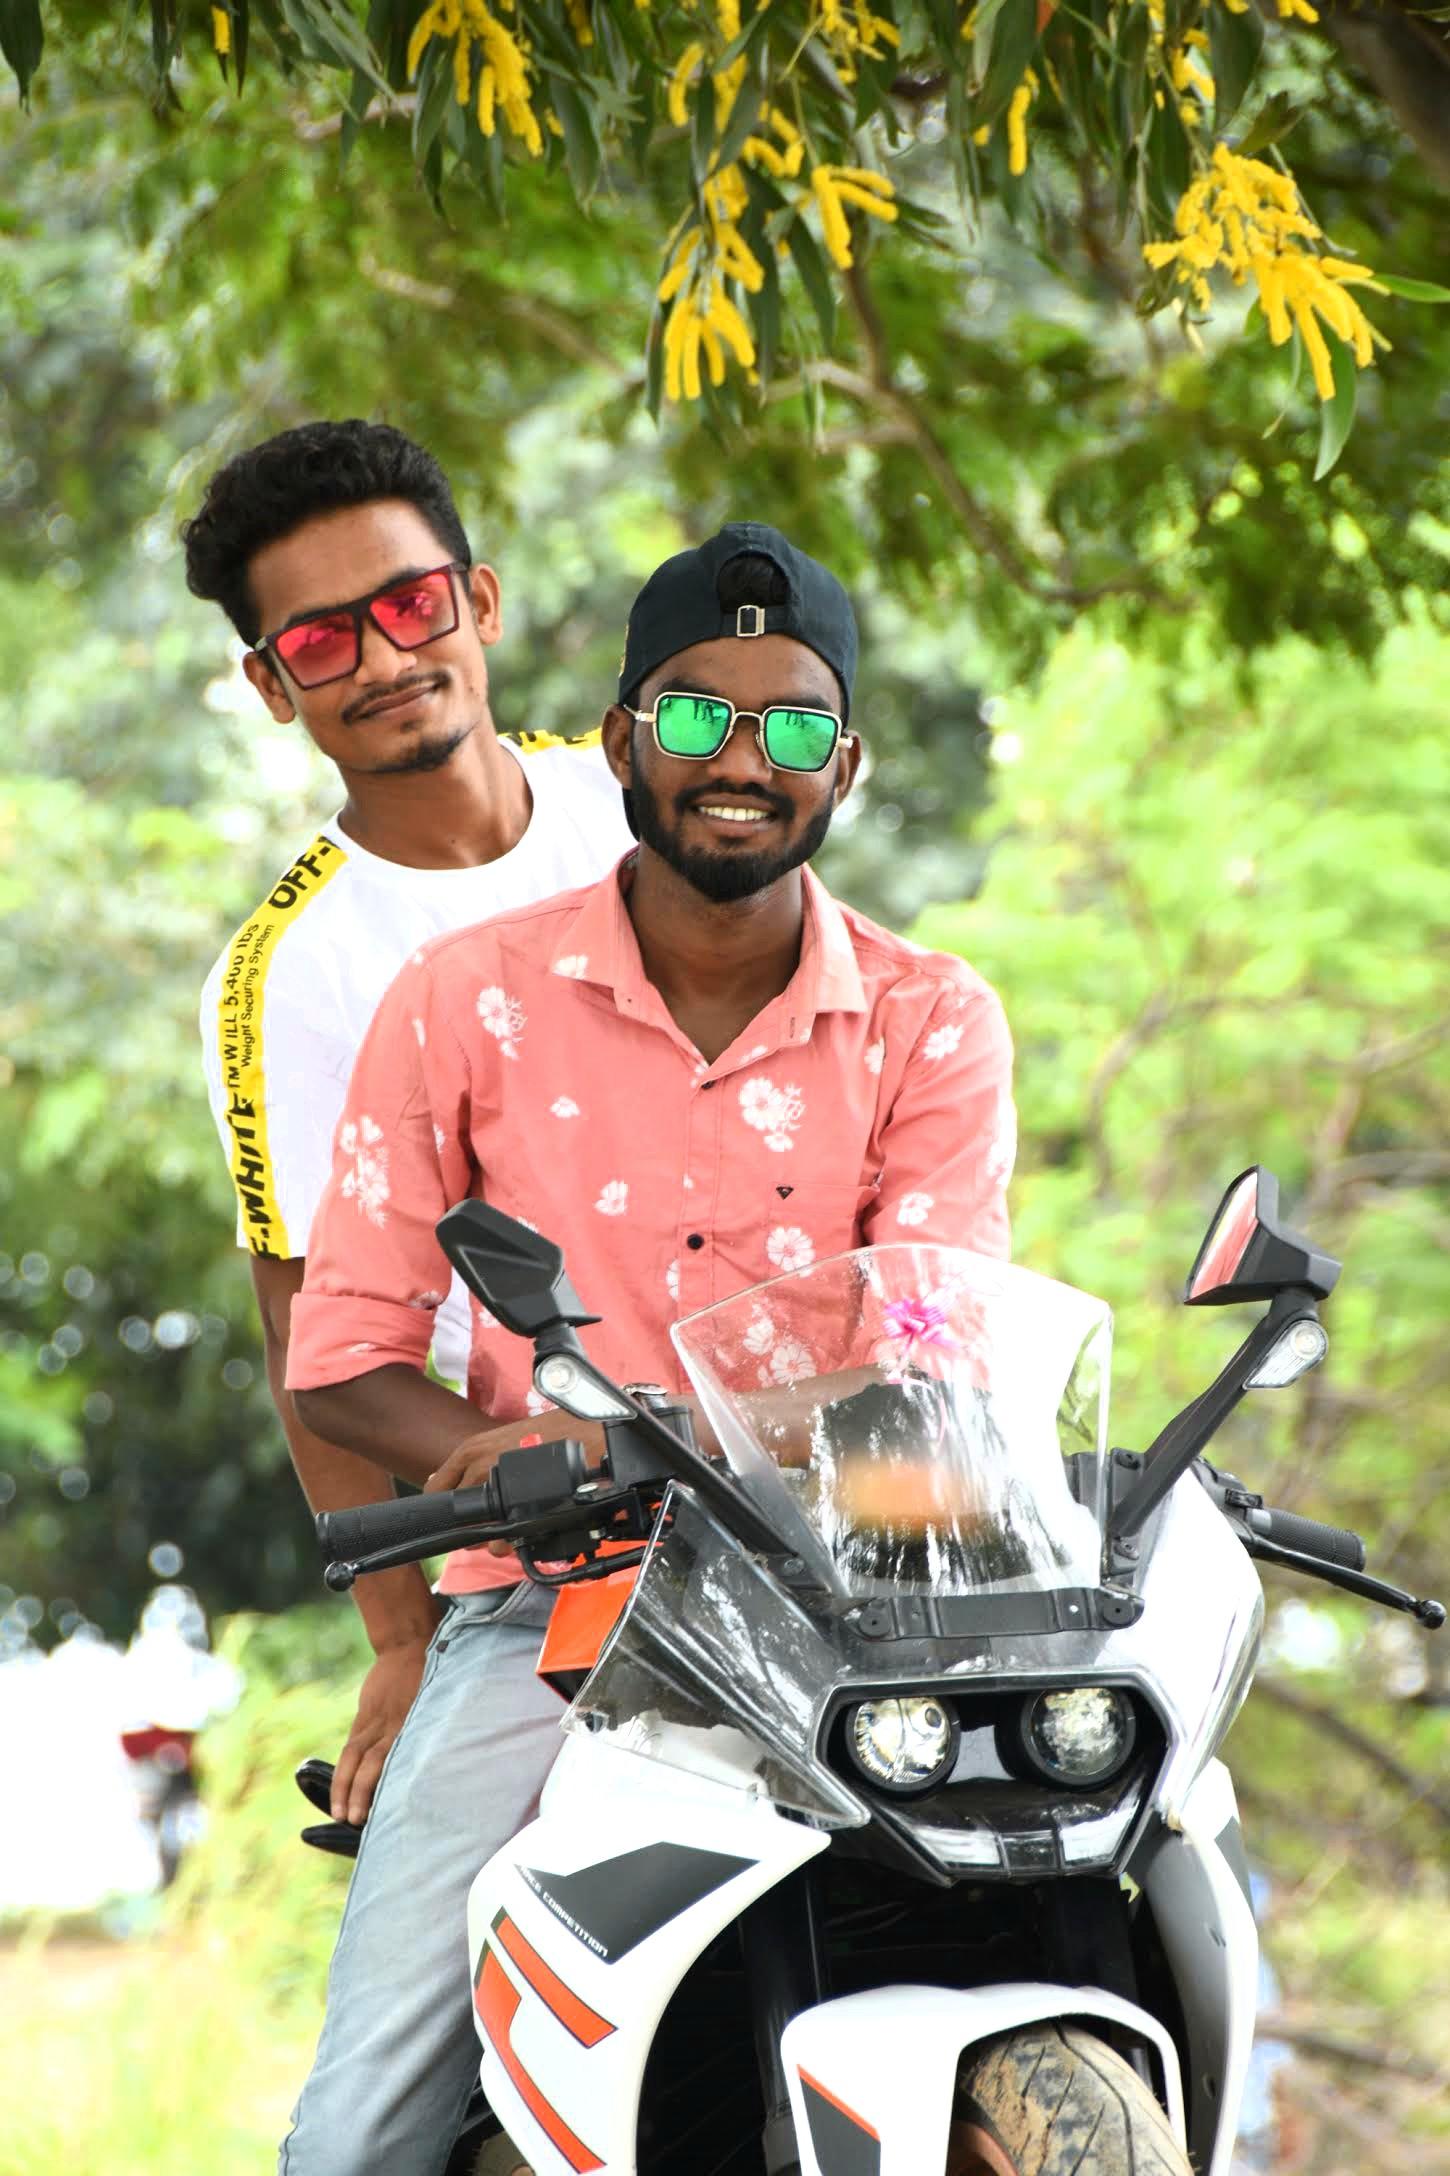 Two boys posing on bike